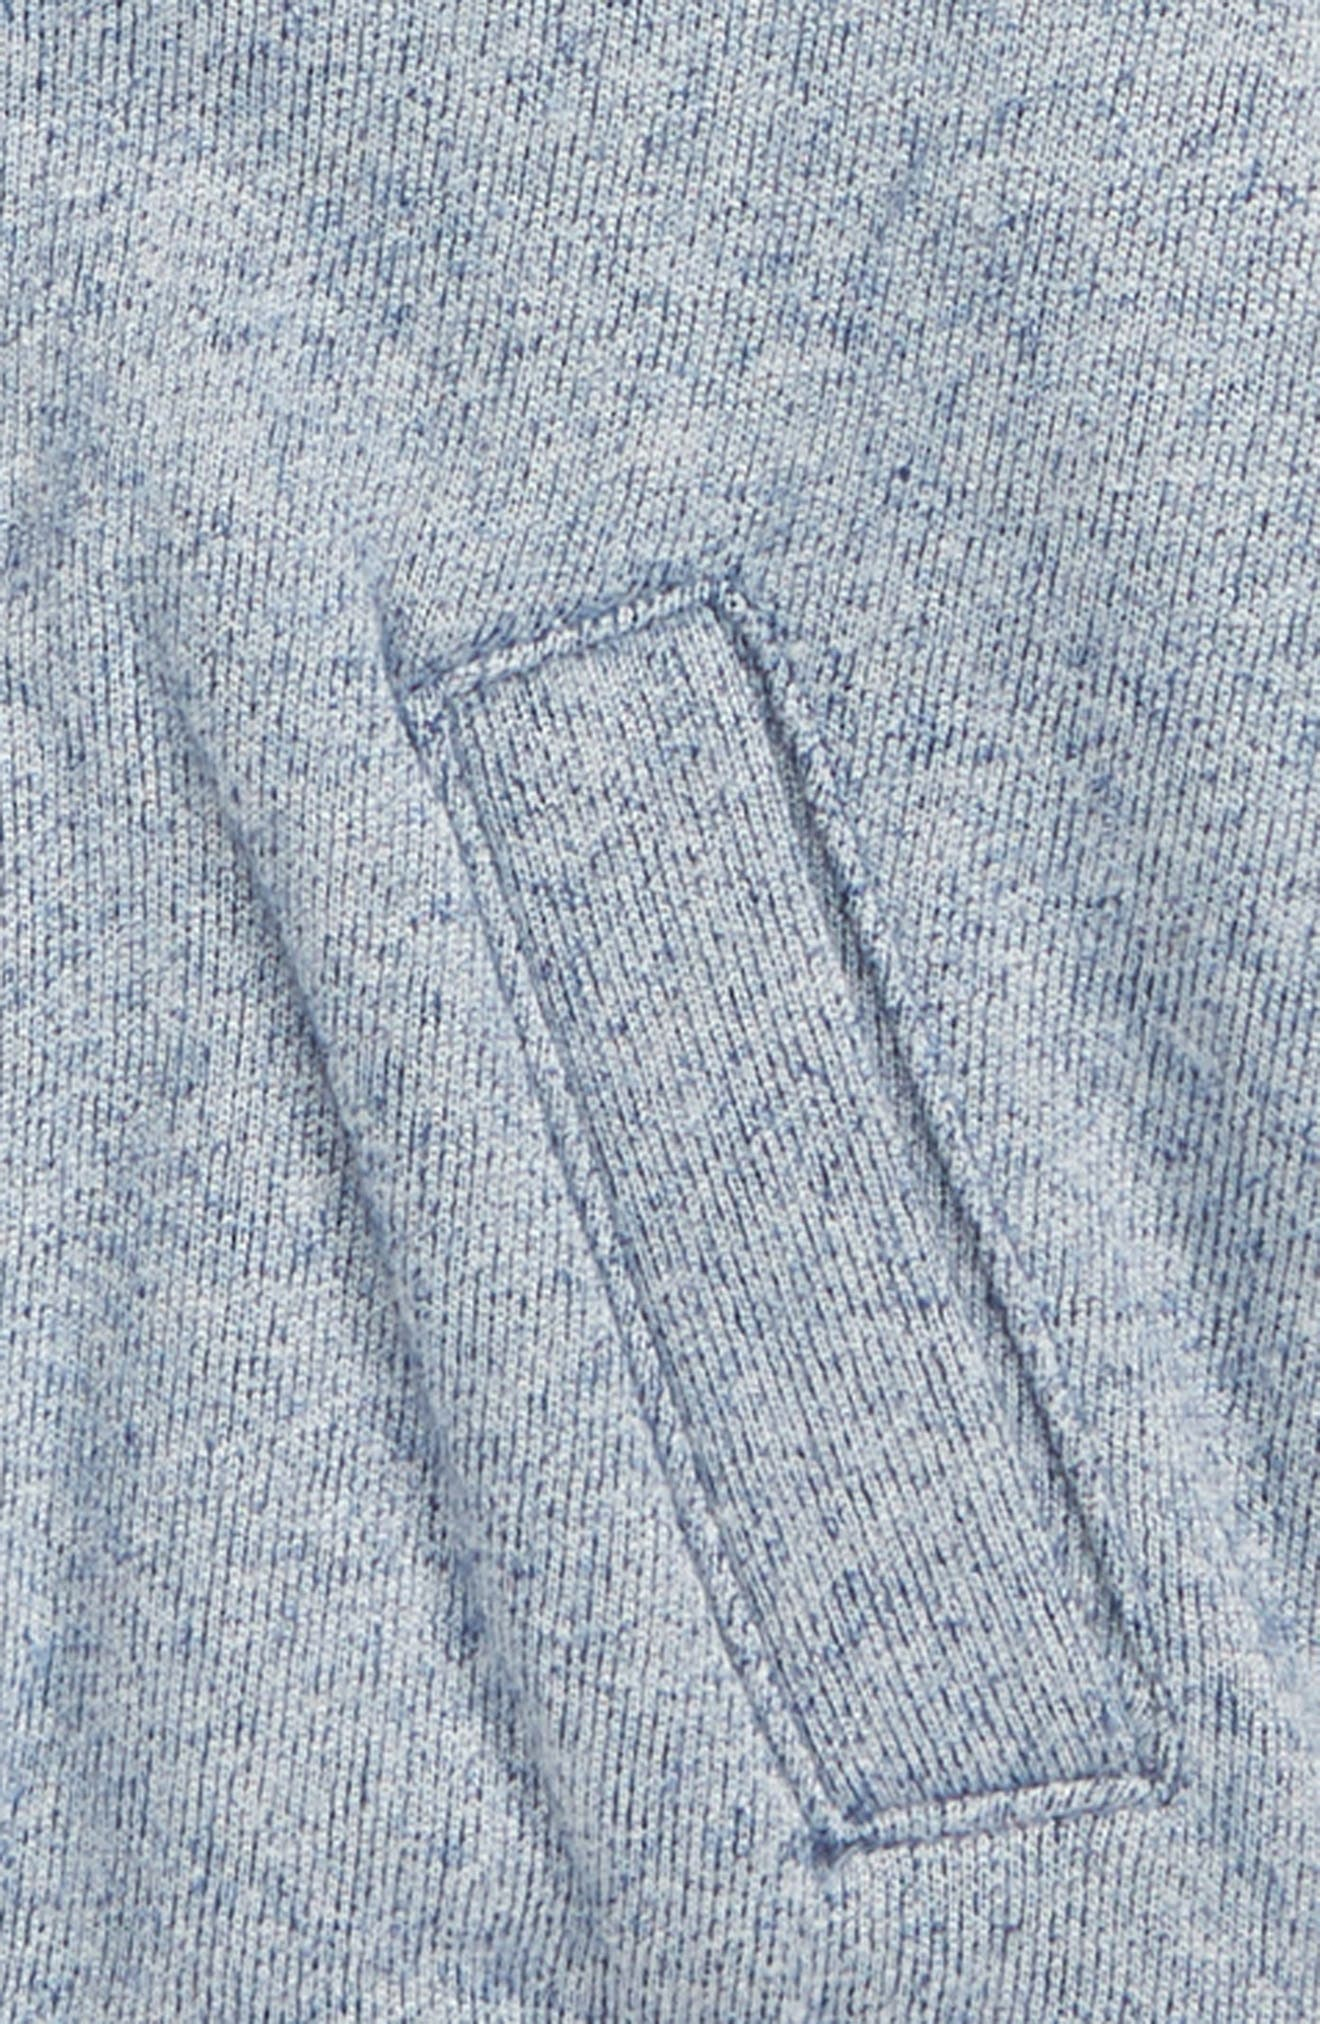 Novelty Varsity Jacket,                             Alternate thumbnail 2, color,                             NAVY DENIM